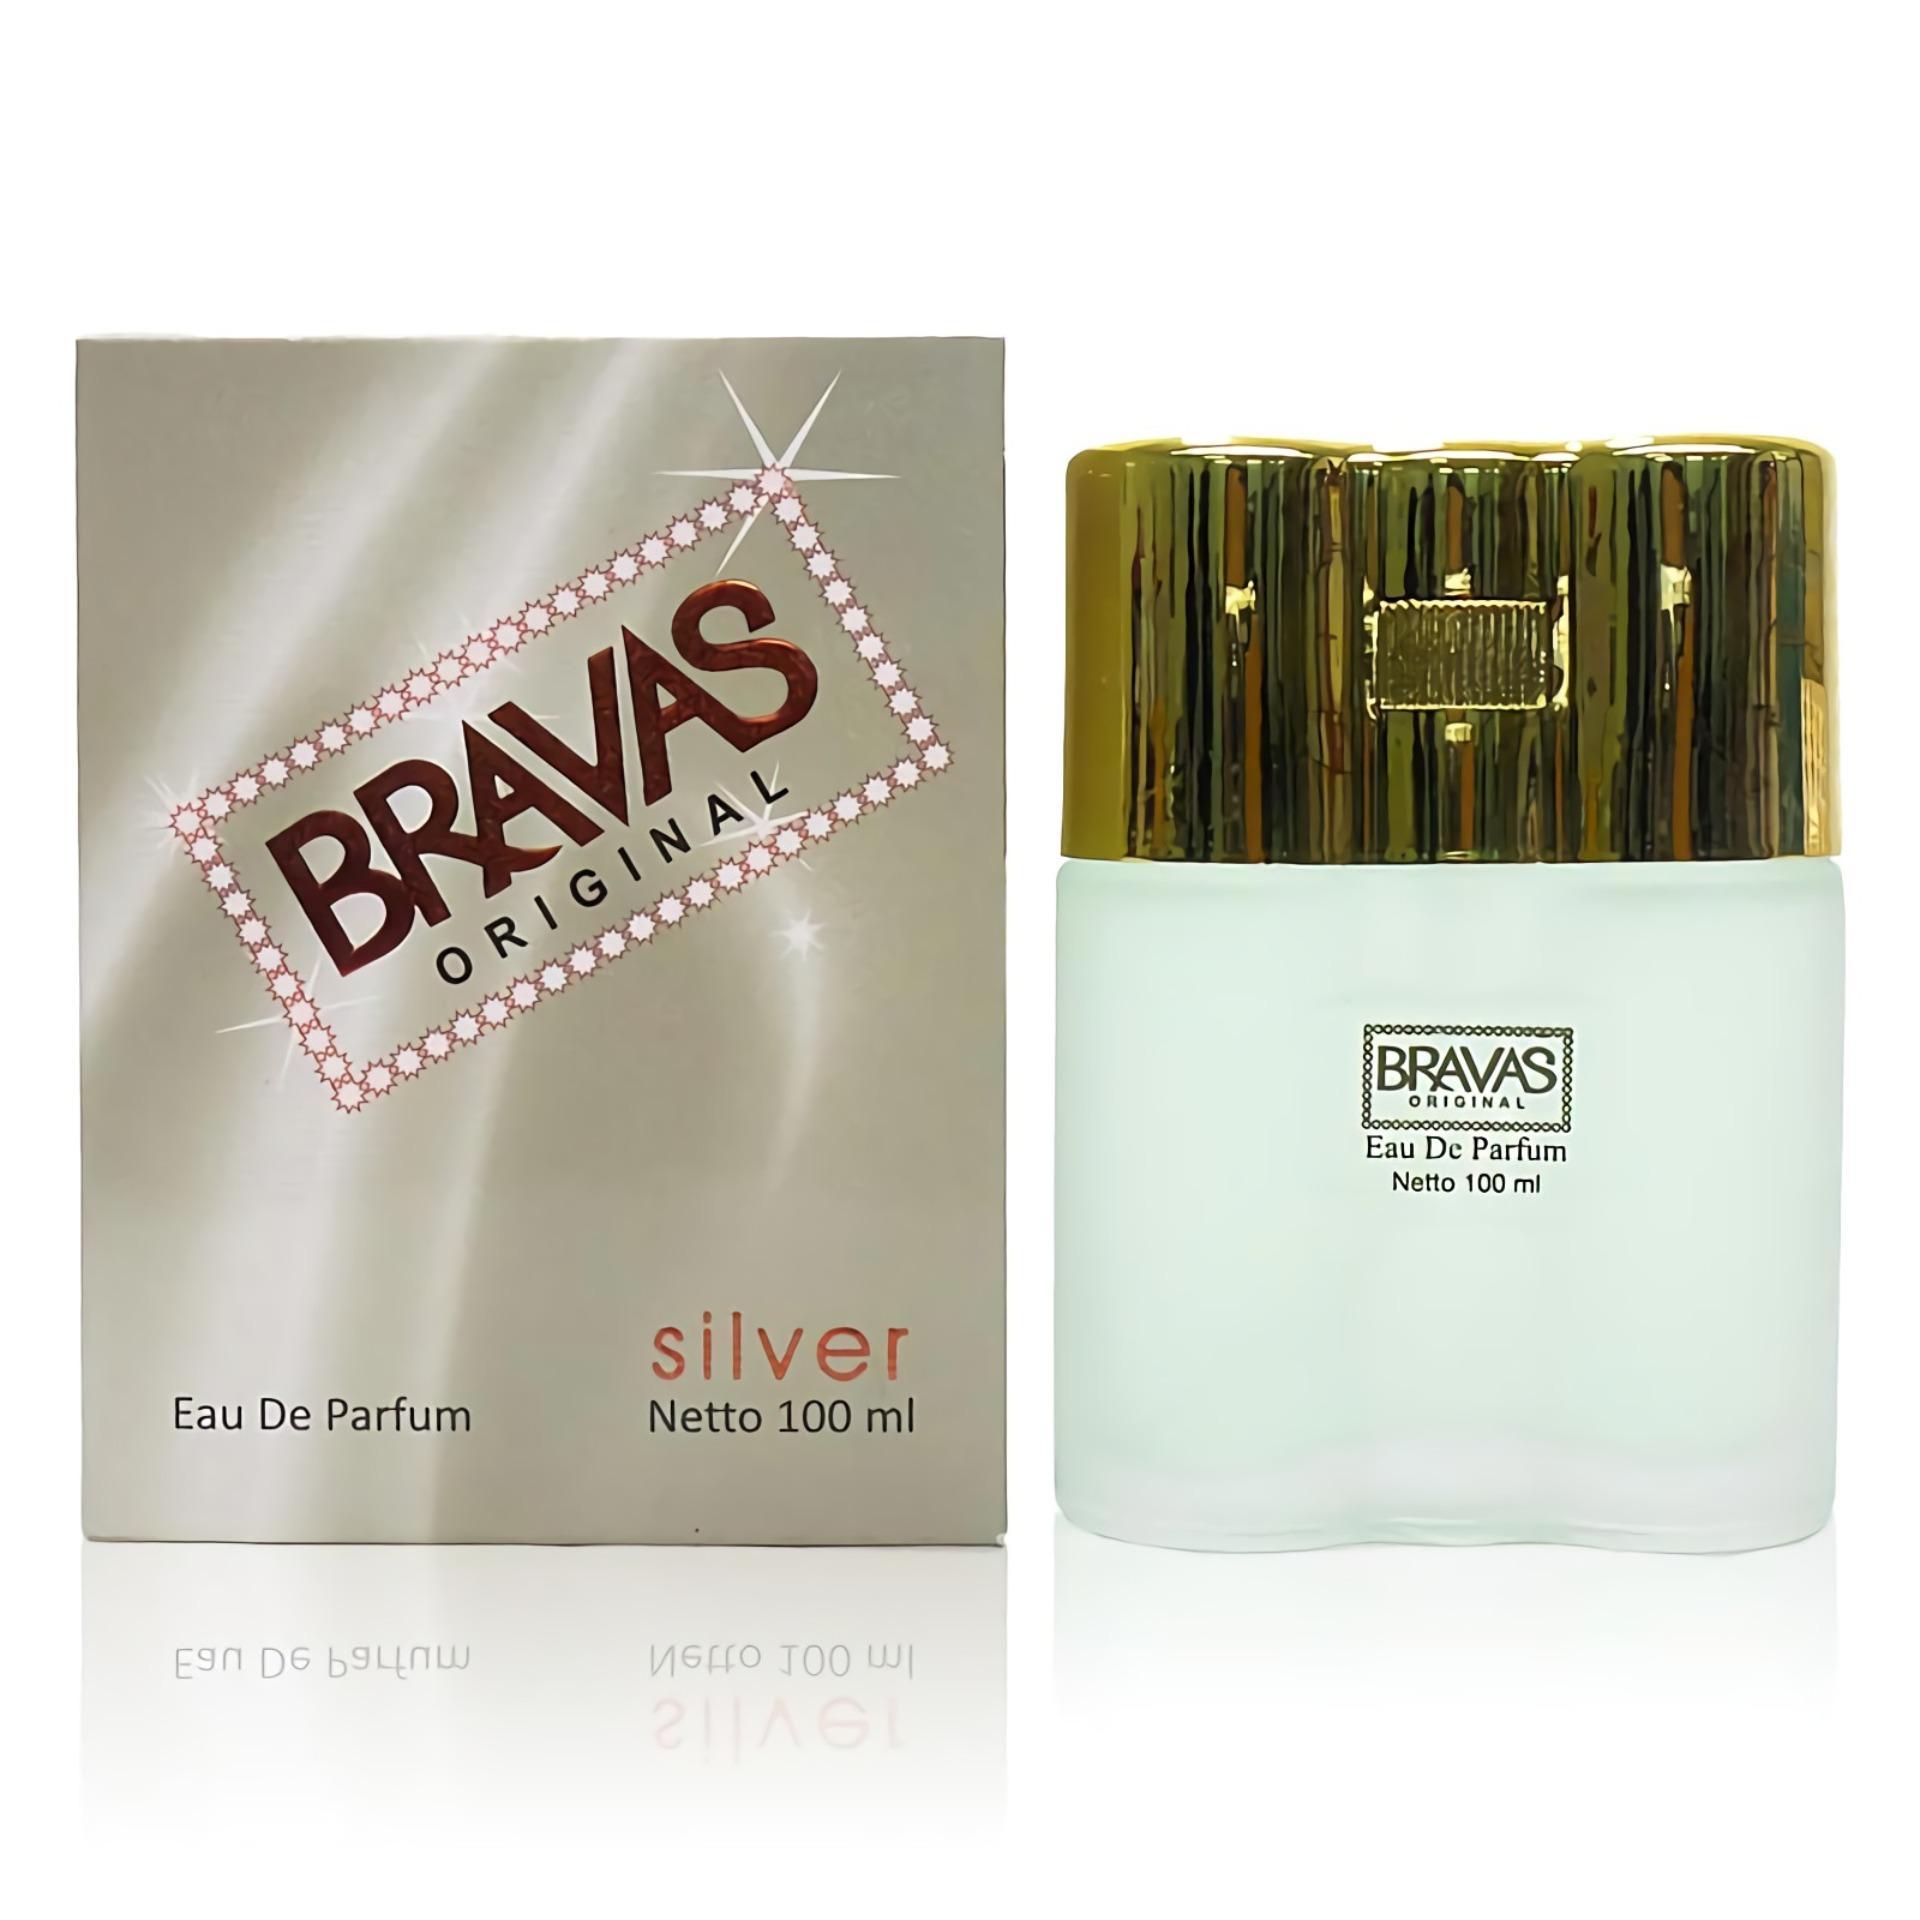 BRAVAS Eau De Parfum XX-CT ORIGINAL 100 ML Perfume Fragrance Pewangi